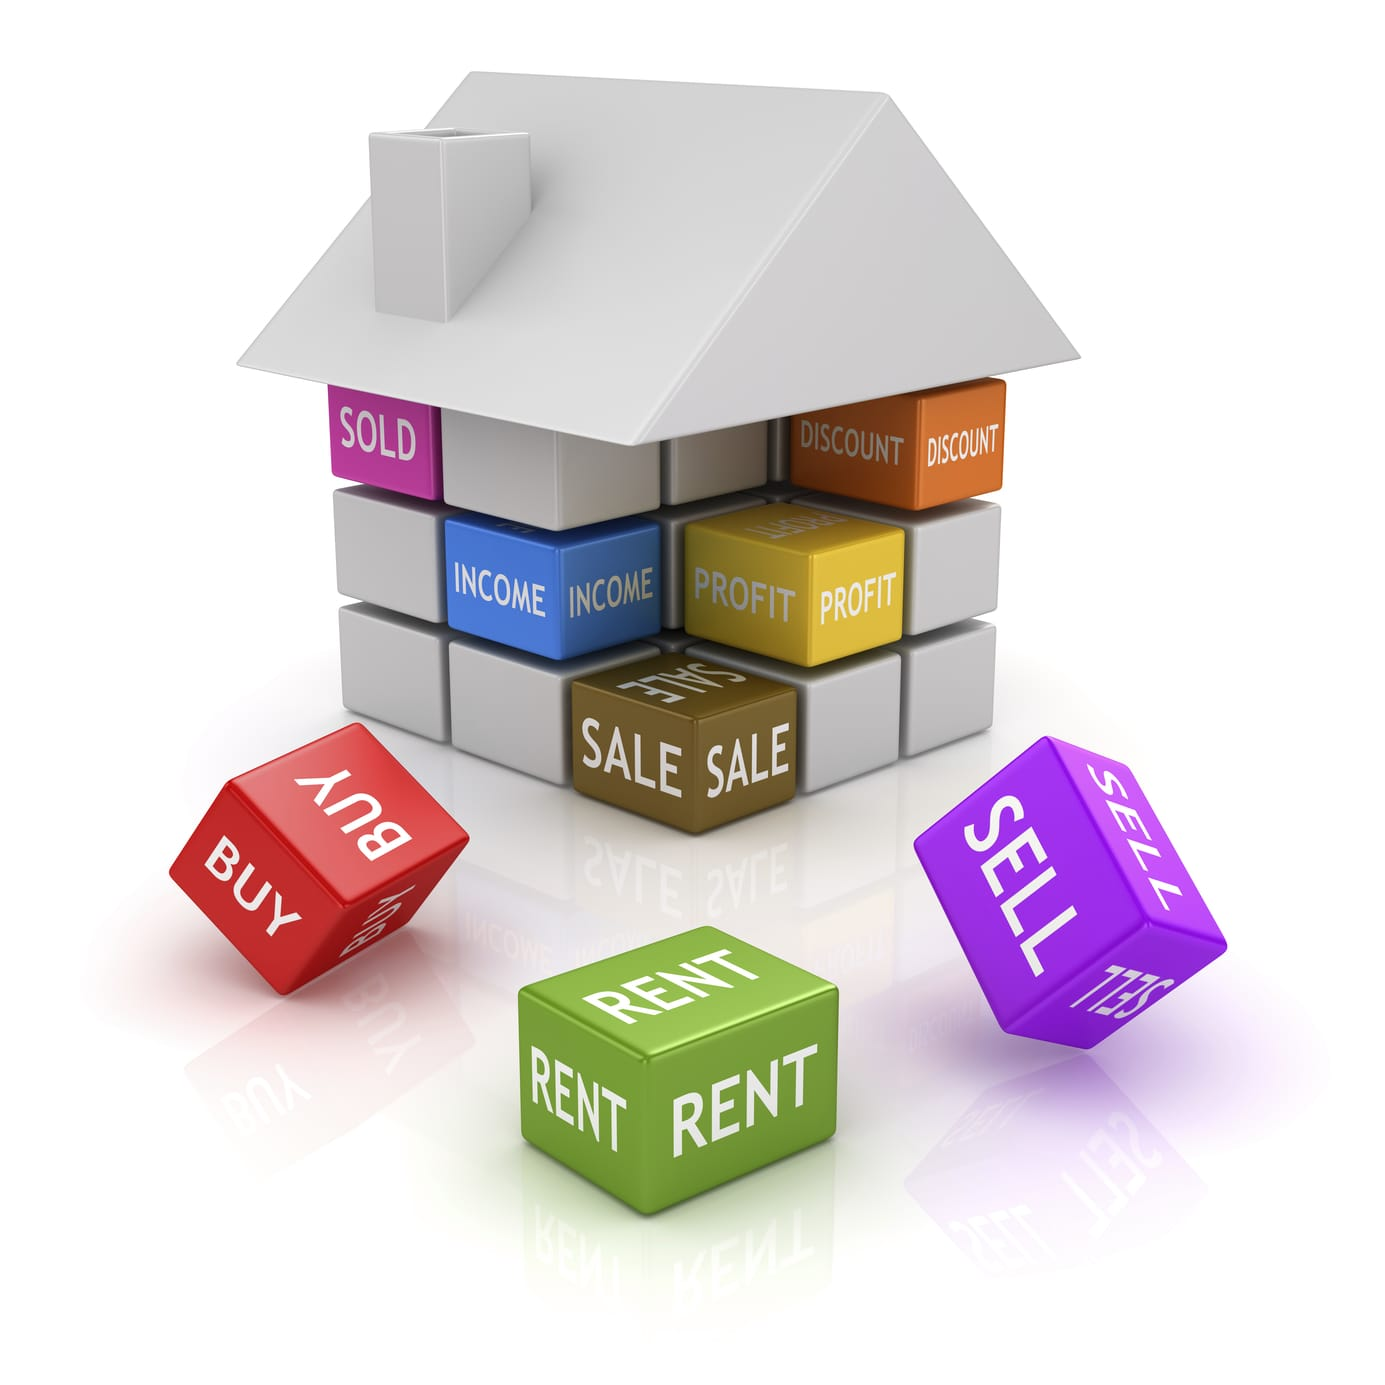 Affordable Housing - RentSeeker